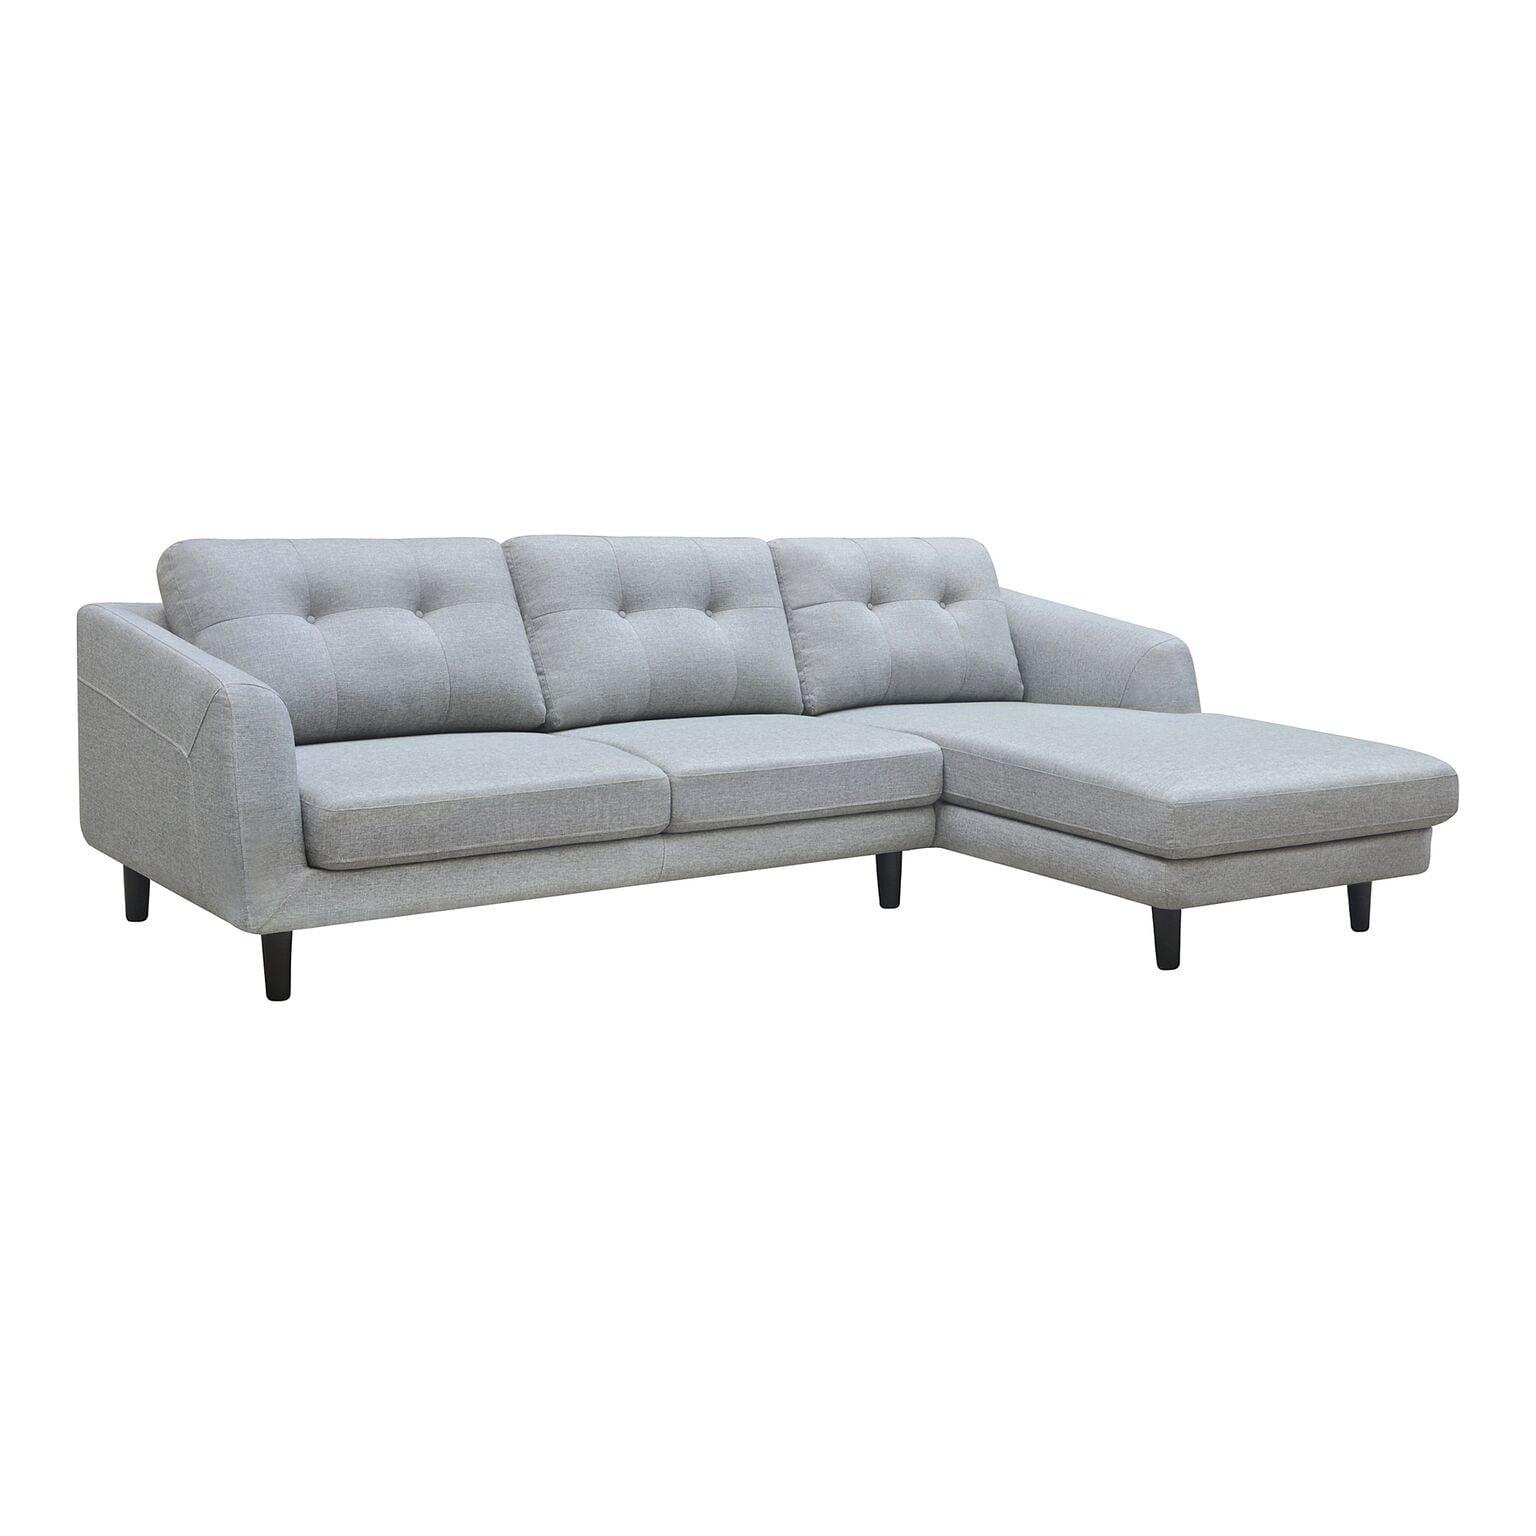 Aurelle Home Mid-Century Sectional Sofa